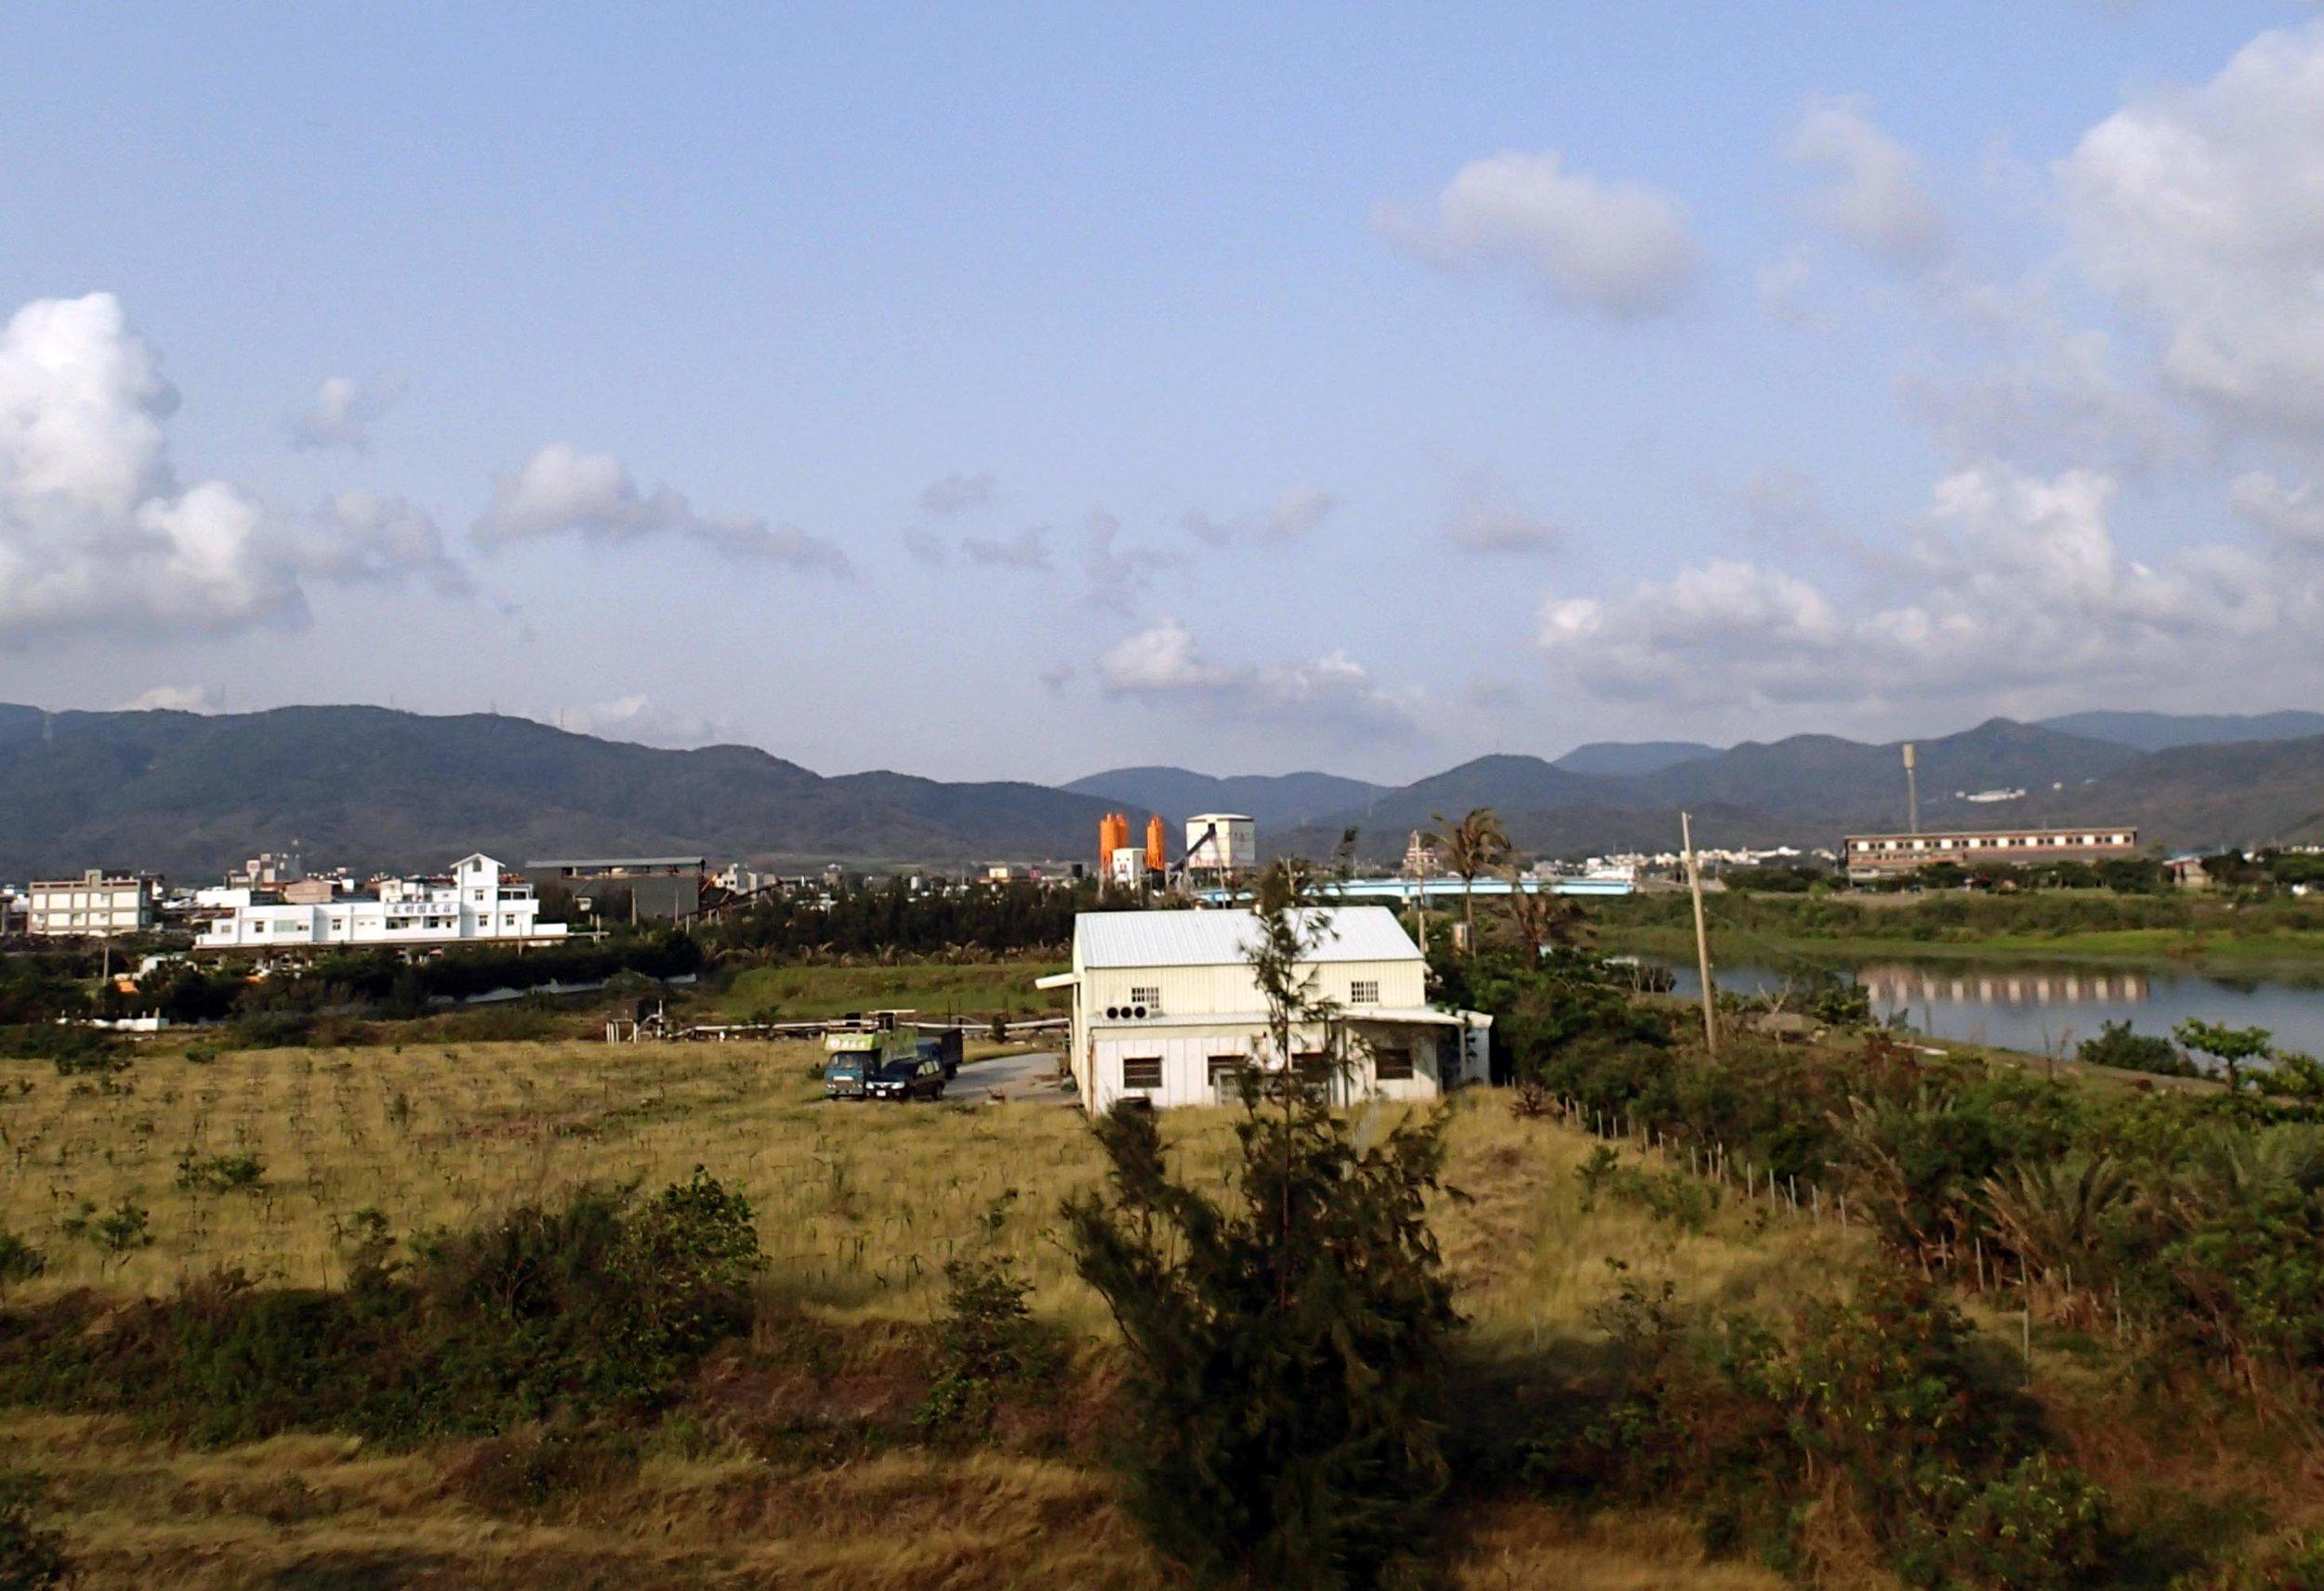 Checheng countryside.jpg